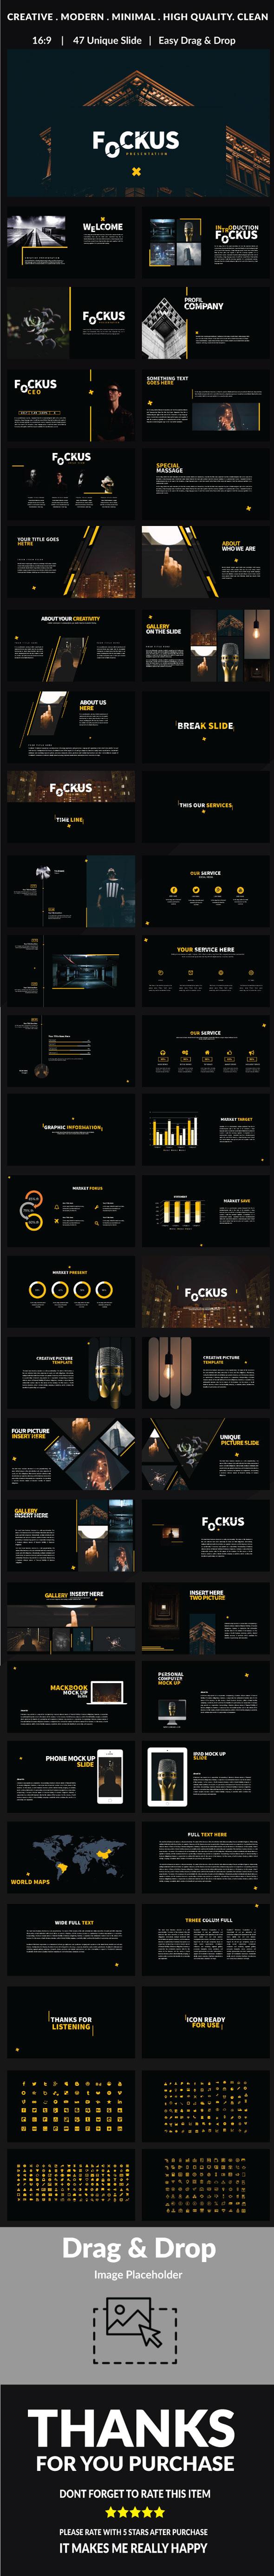 Fockus - Multipurpose Powerpoint - PowerPoint Templates Presentation Templates